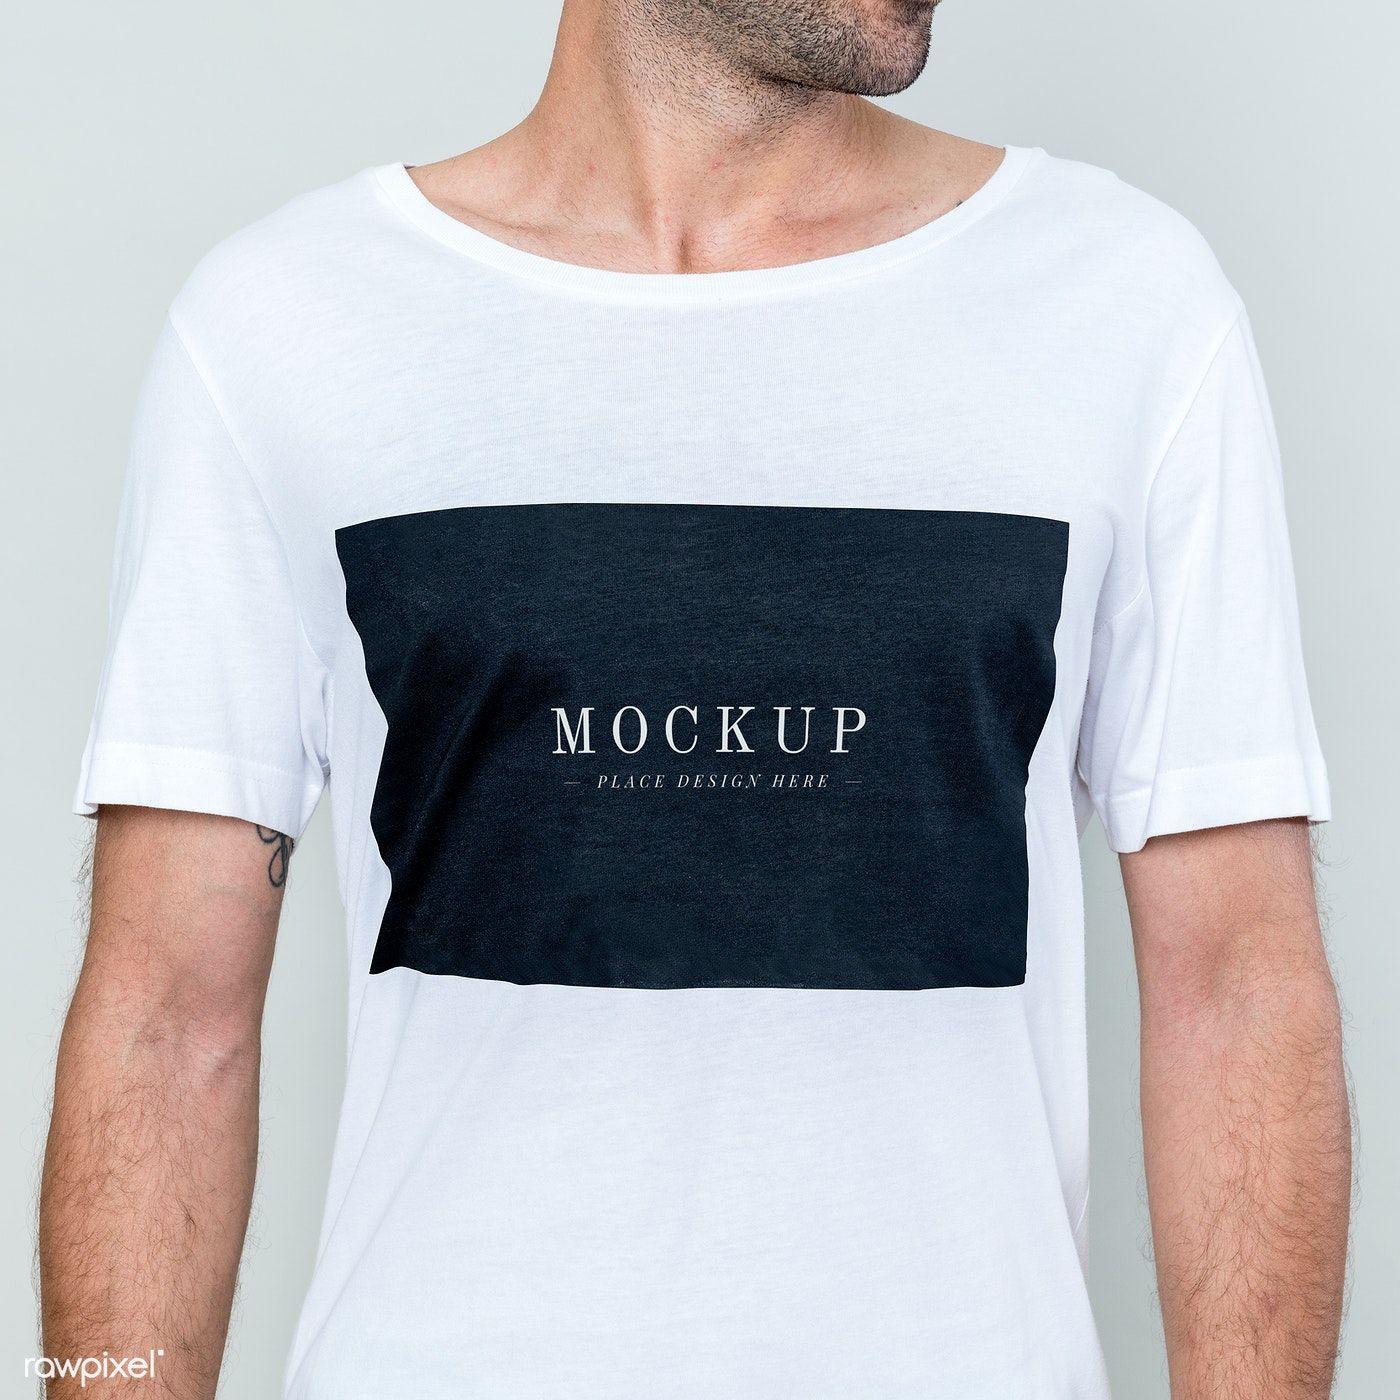 Download Download Premium Psd Of Man Wearing White T Shirt Mockup 2291273 Shirt Mockup White Tshirt Men Hoodie Mockup